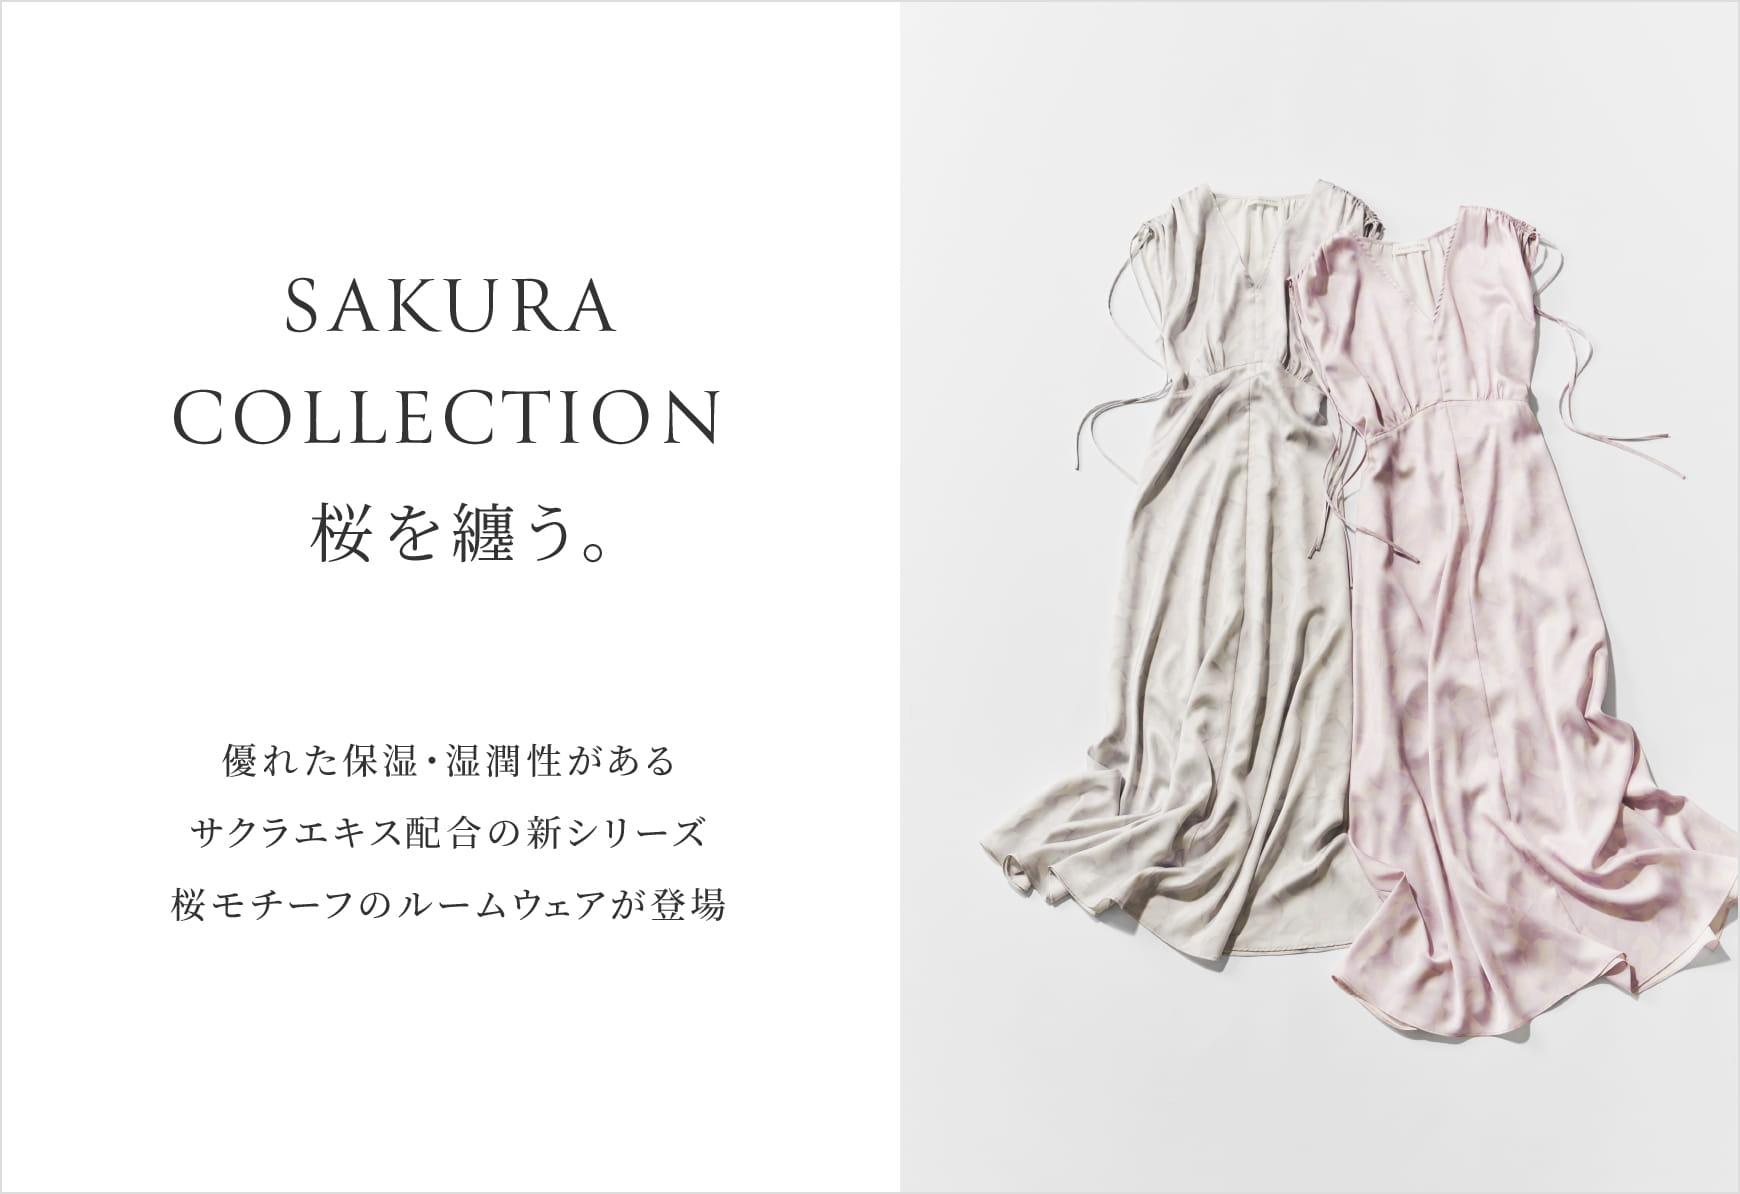 SAKURA COLLECTION 桜を纏う。優れた保湿・湿潤性があるサクラエキス配合の新シリーズ 桜モチーフのルームウェアが登場